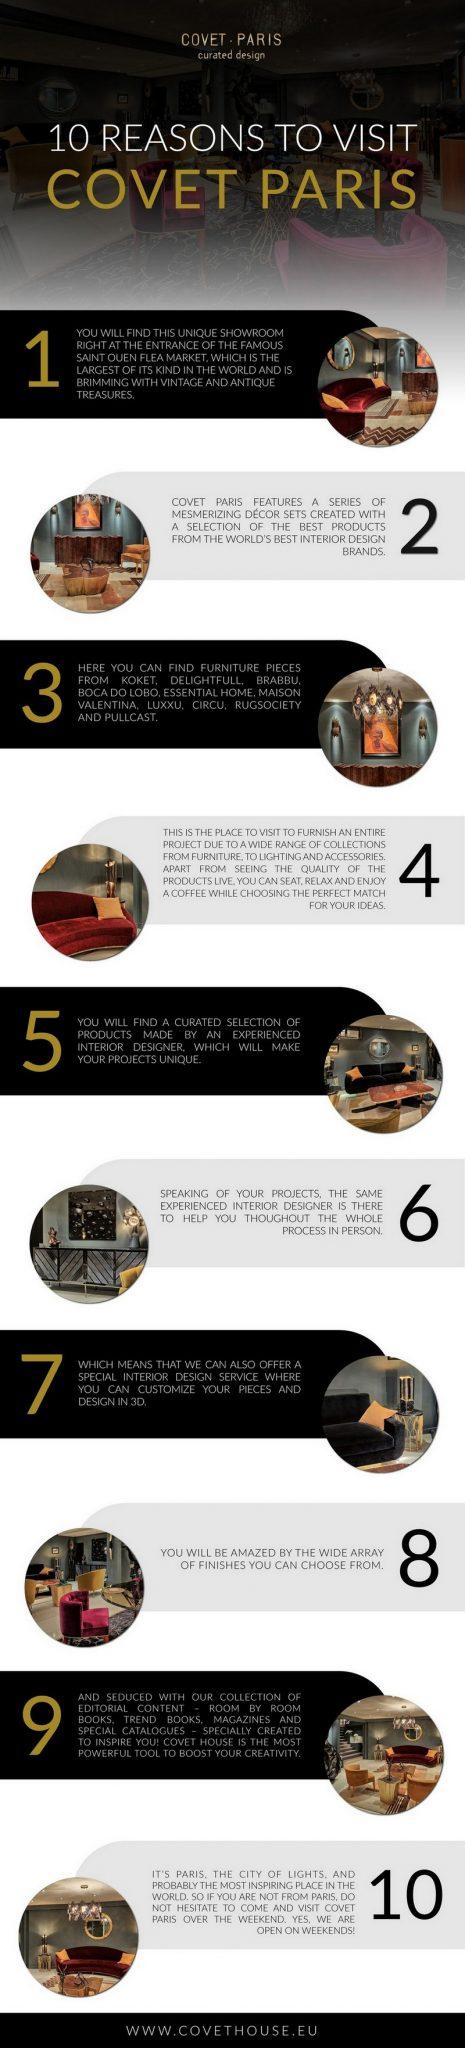 Interior Design Spotlight 10 Reasons Why One Should Visit Covet Paris 1 interior design Interior Design Spotlight: 10 Reasons Why One Should Visit Covet Paris Interior Design Spotlight 10 Reasons Why One Should Visit Covet Paris 1